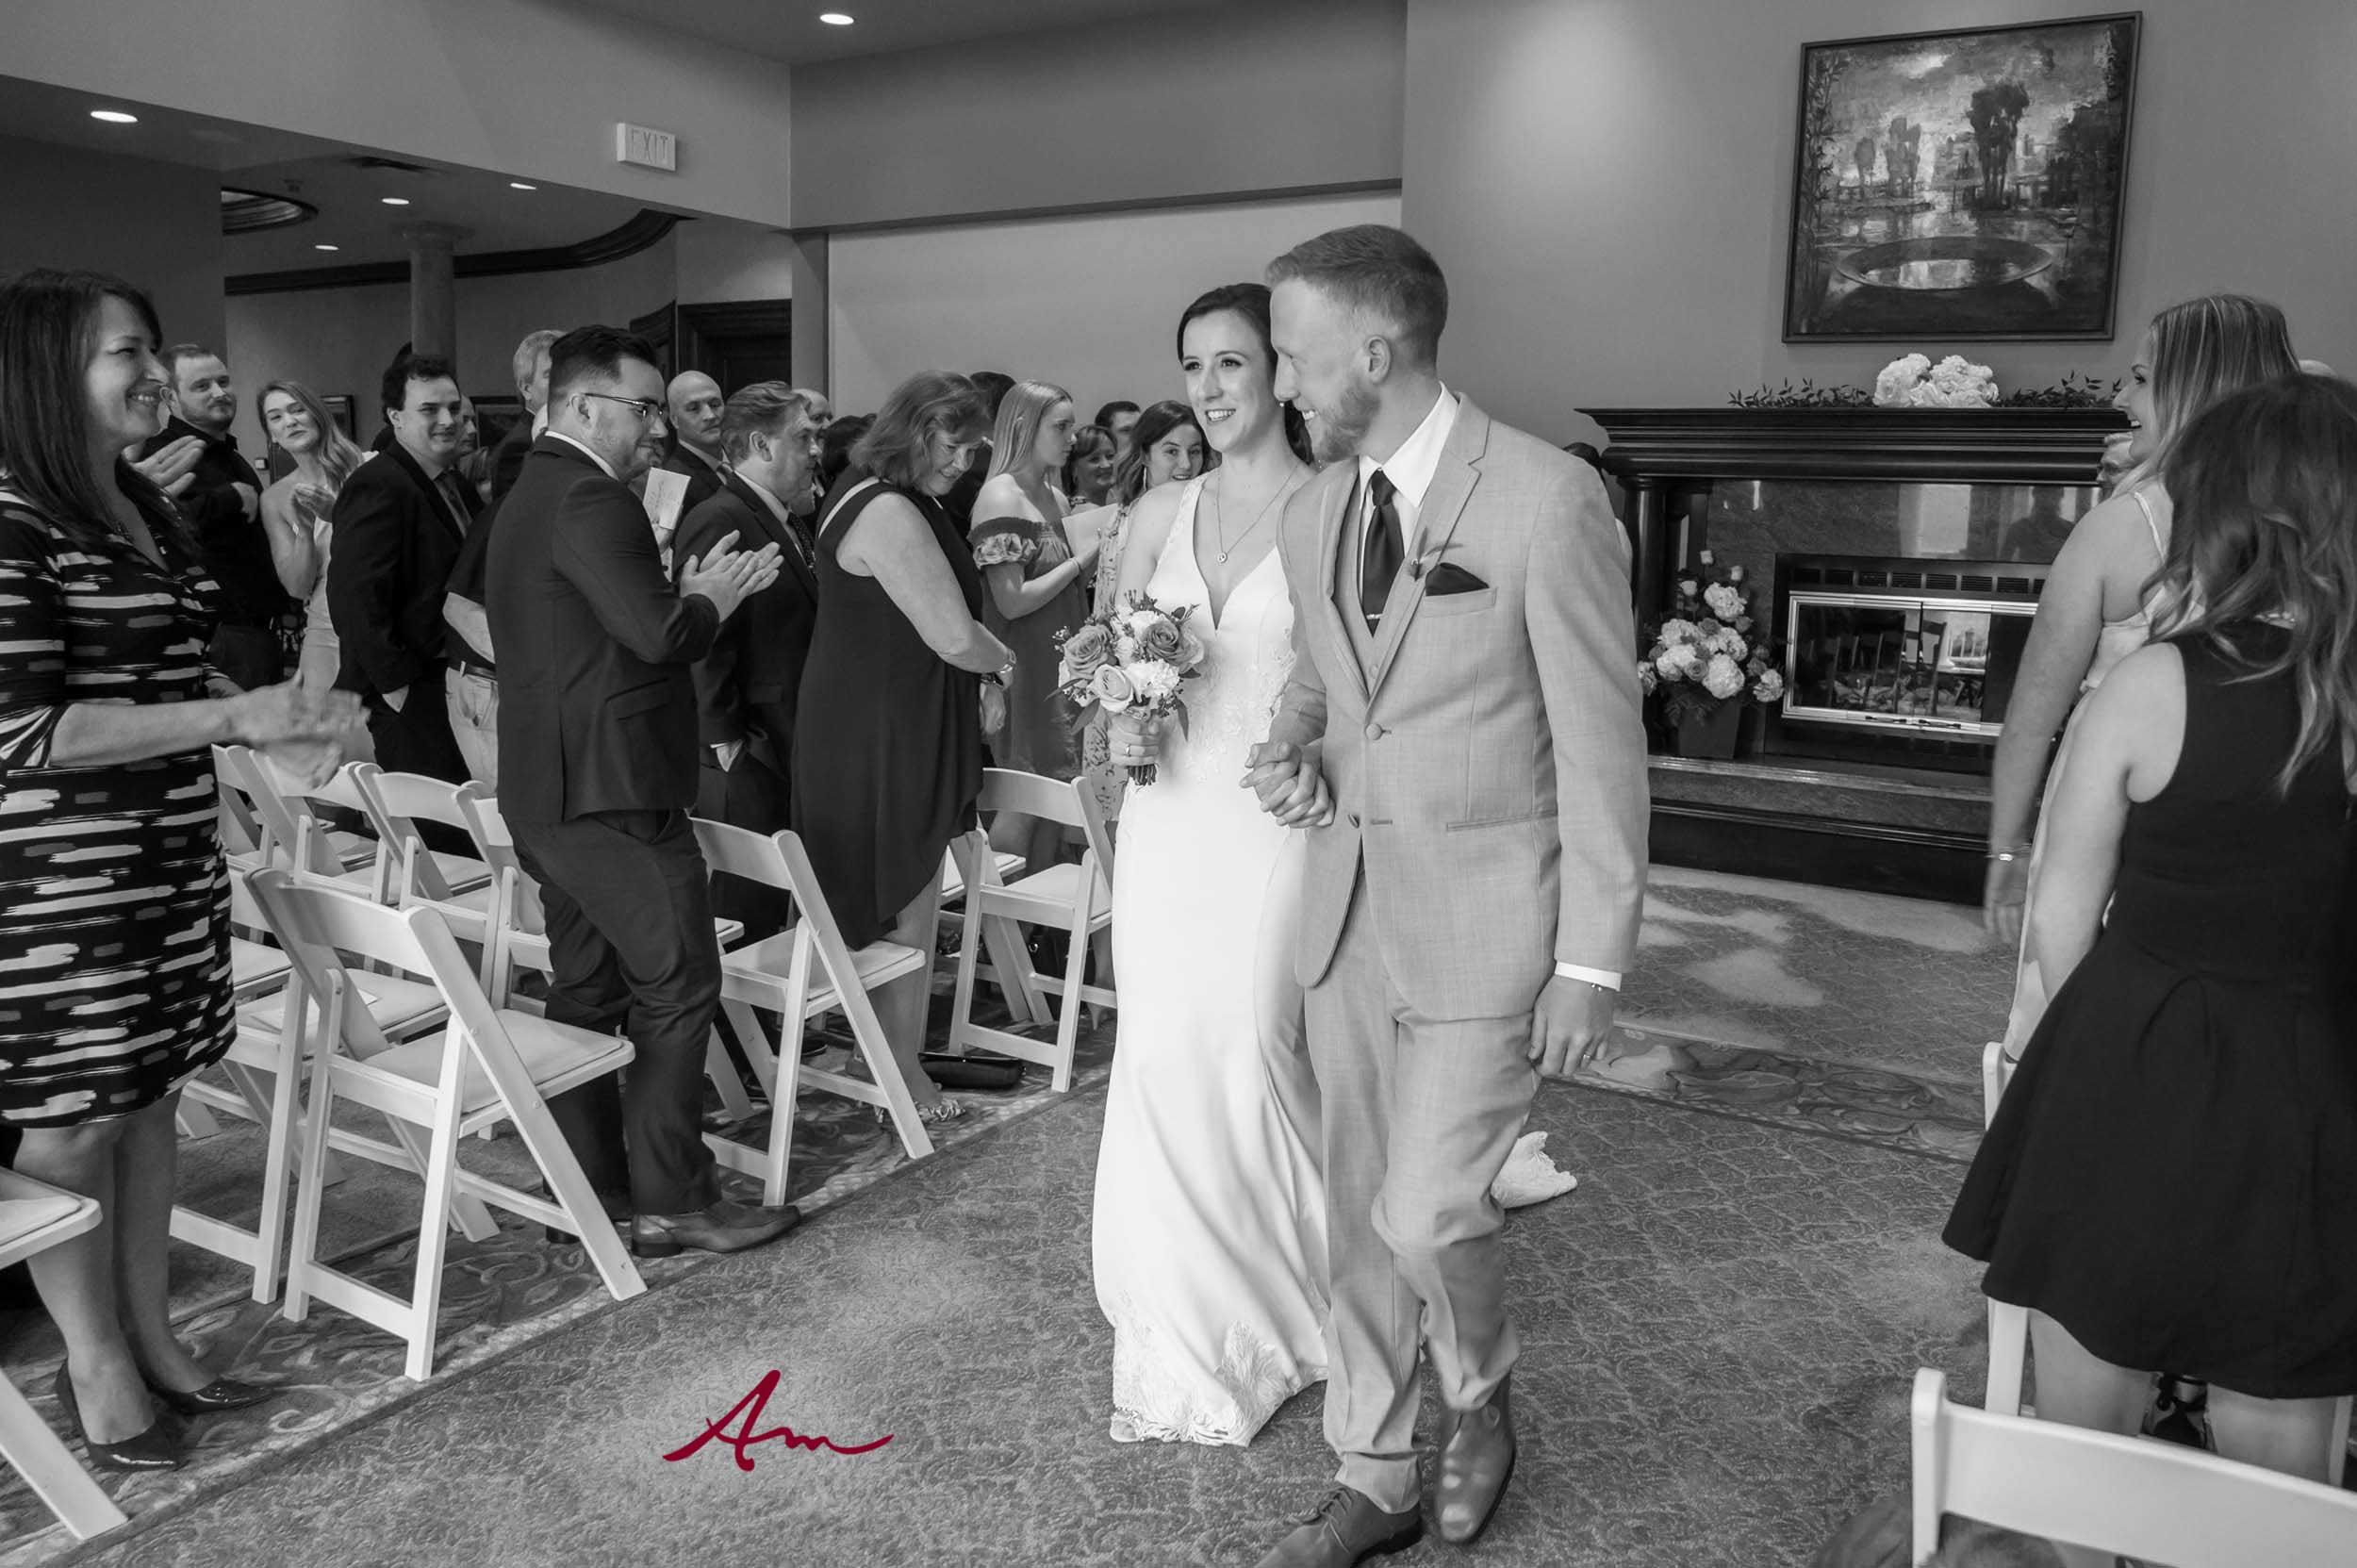 Fox-Harb'r-Wedding-Ceremony-Walk.jpg